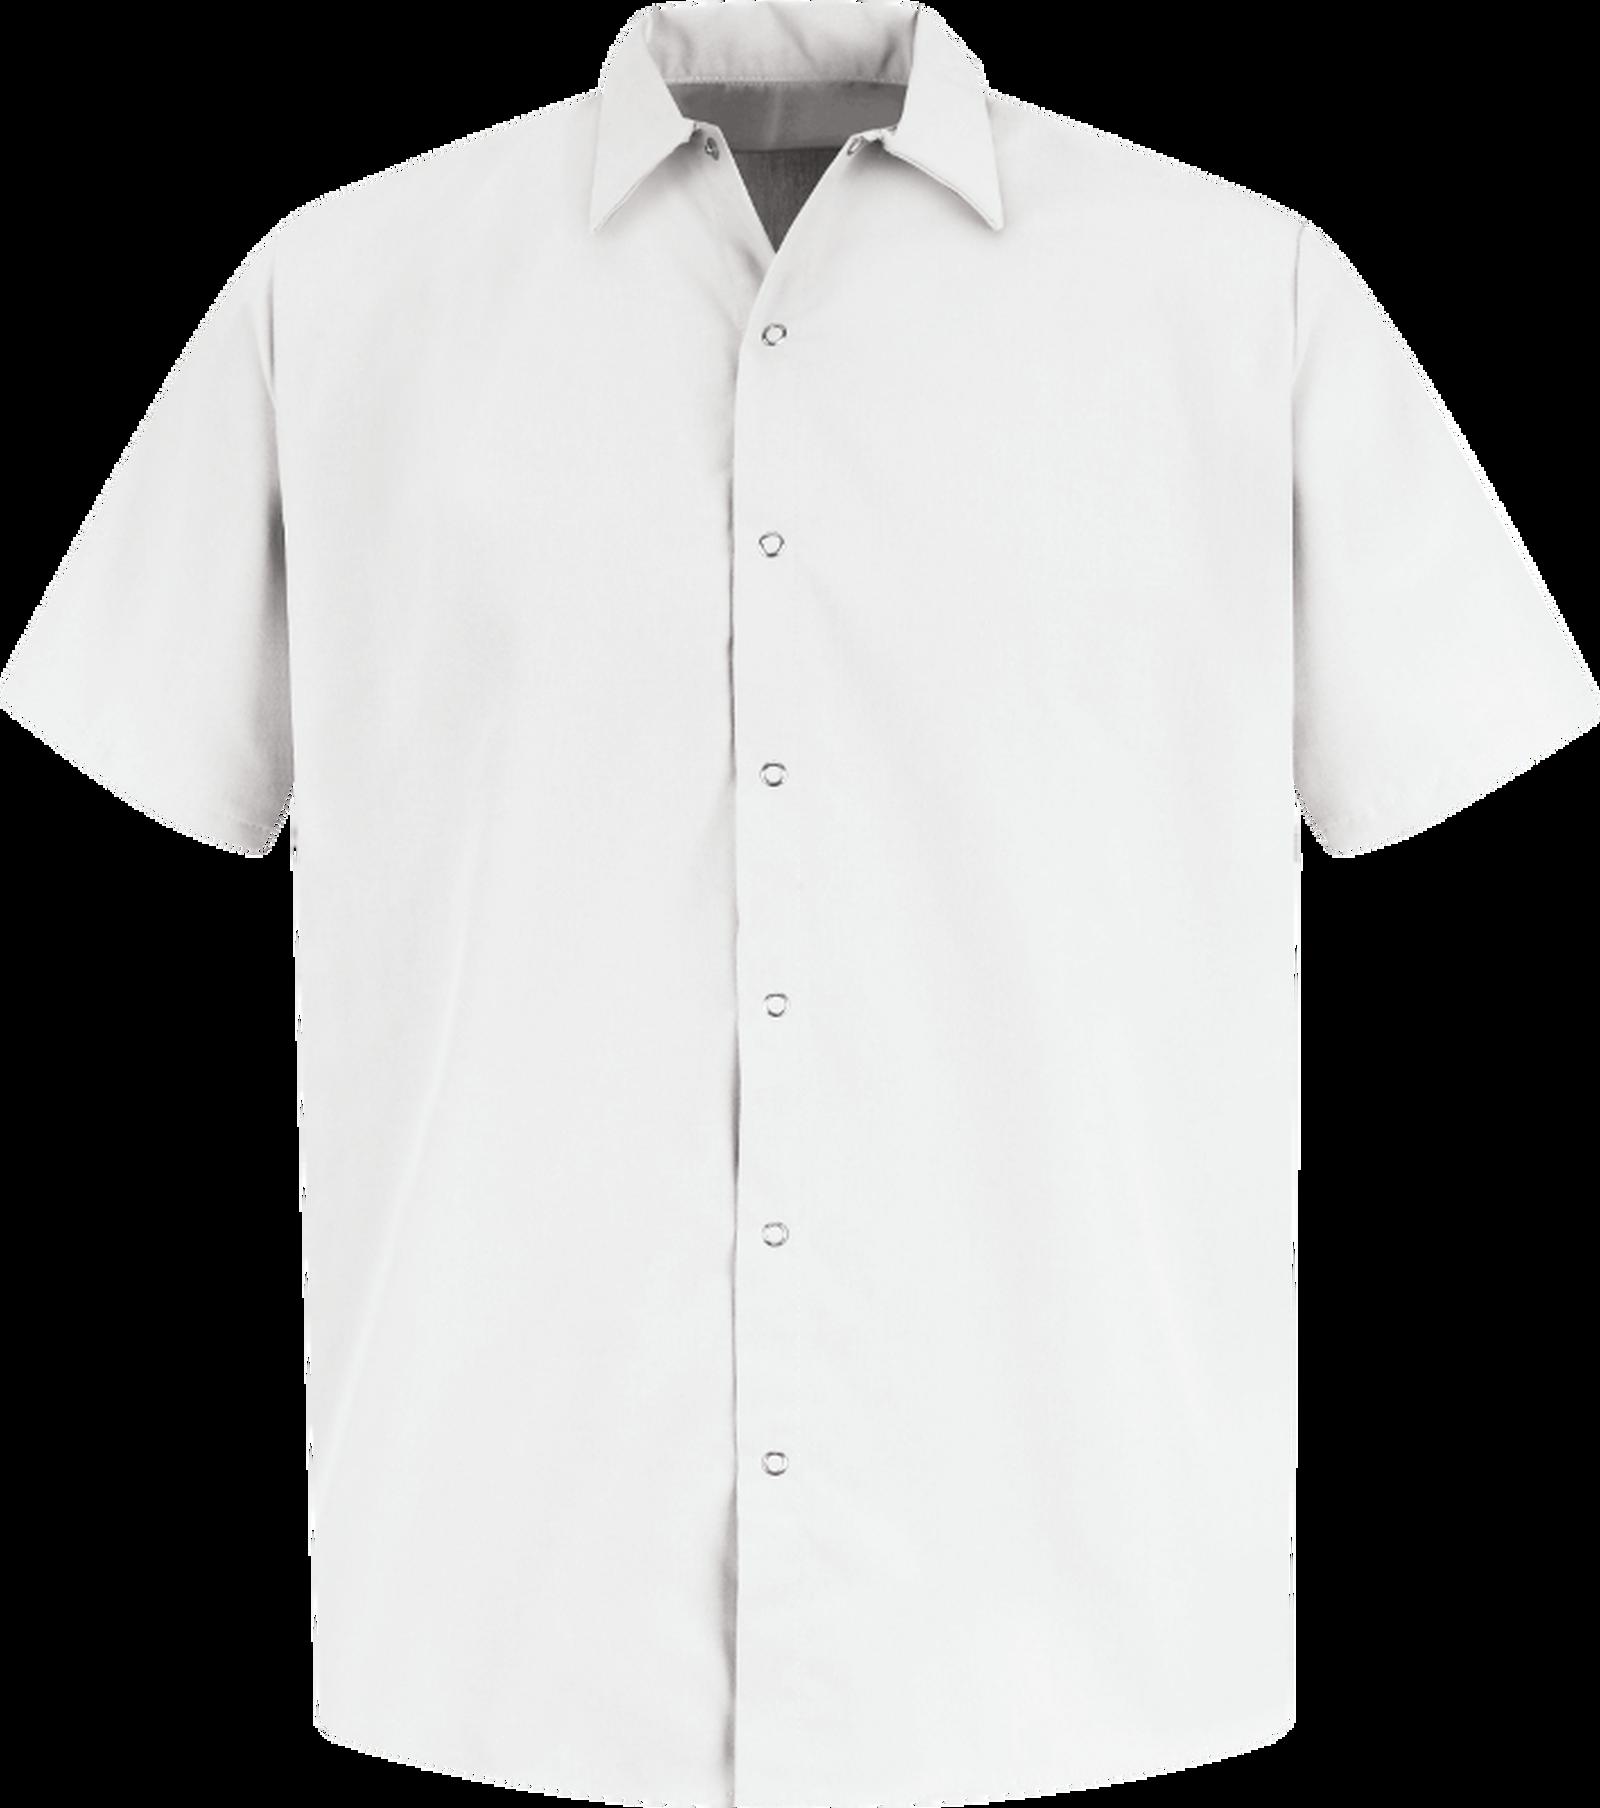 Men's Short Sleeve Specialized Pocketless Polyester Work Shirt